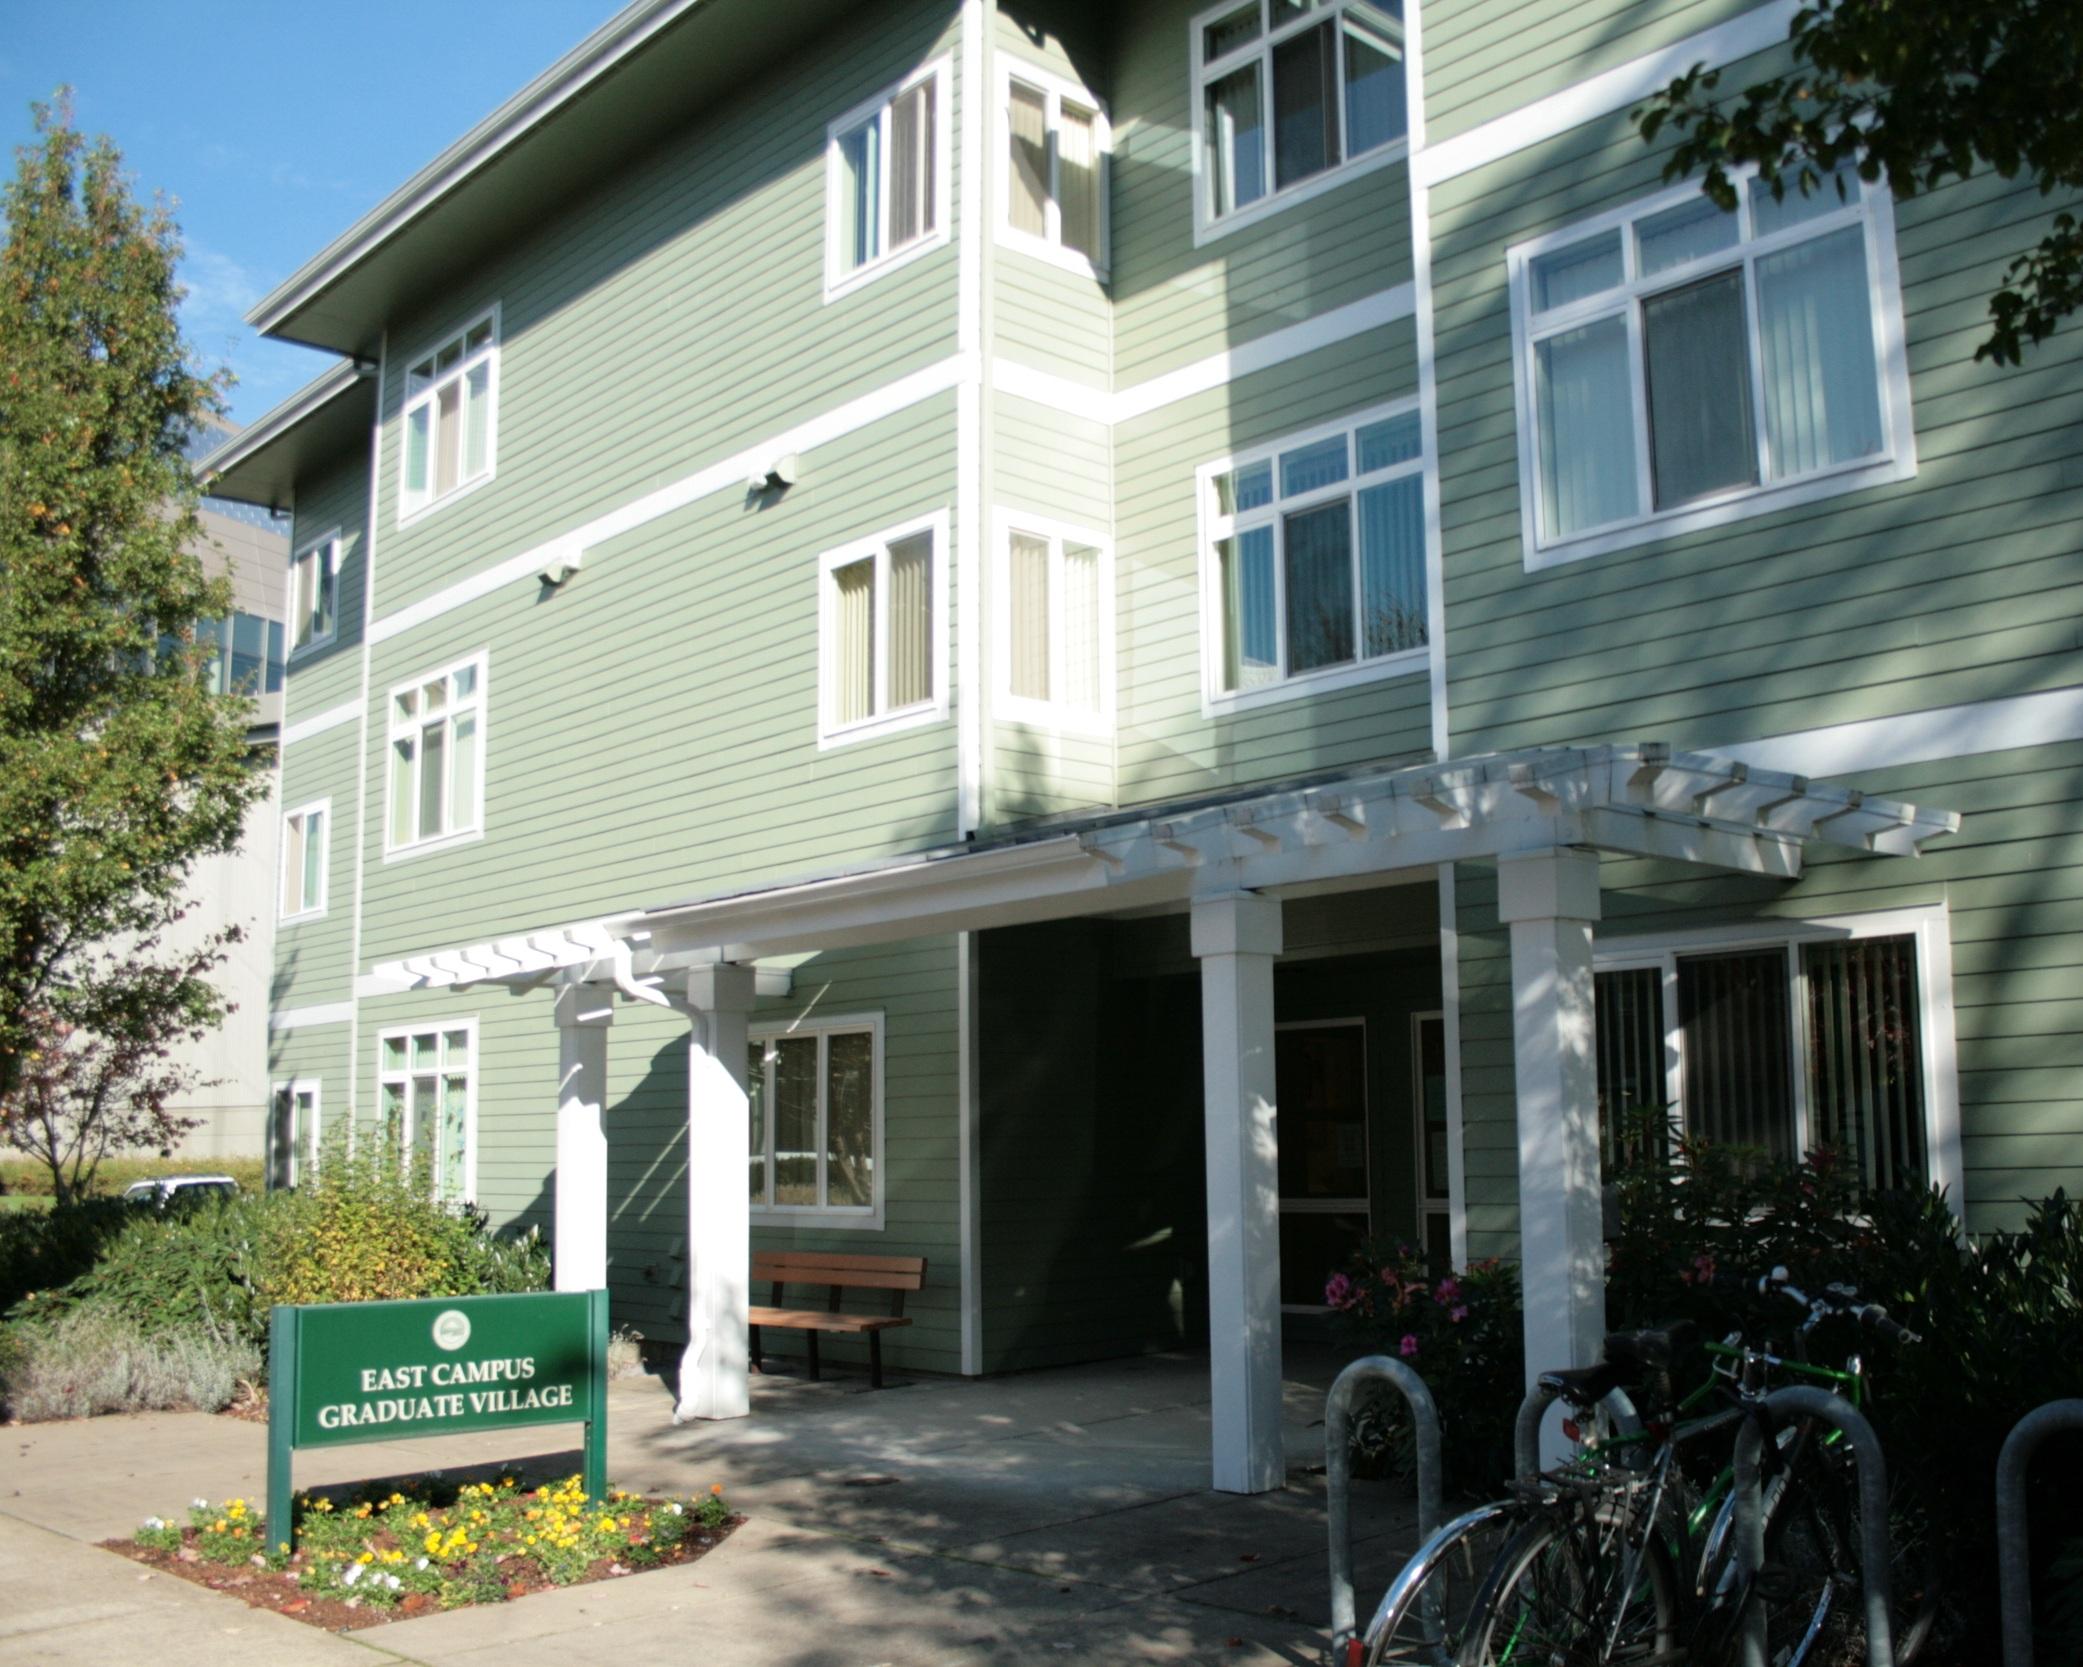 Graduate Village - University of Oregon